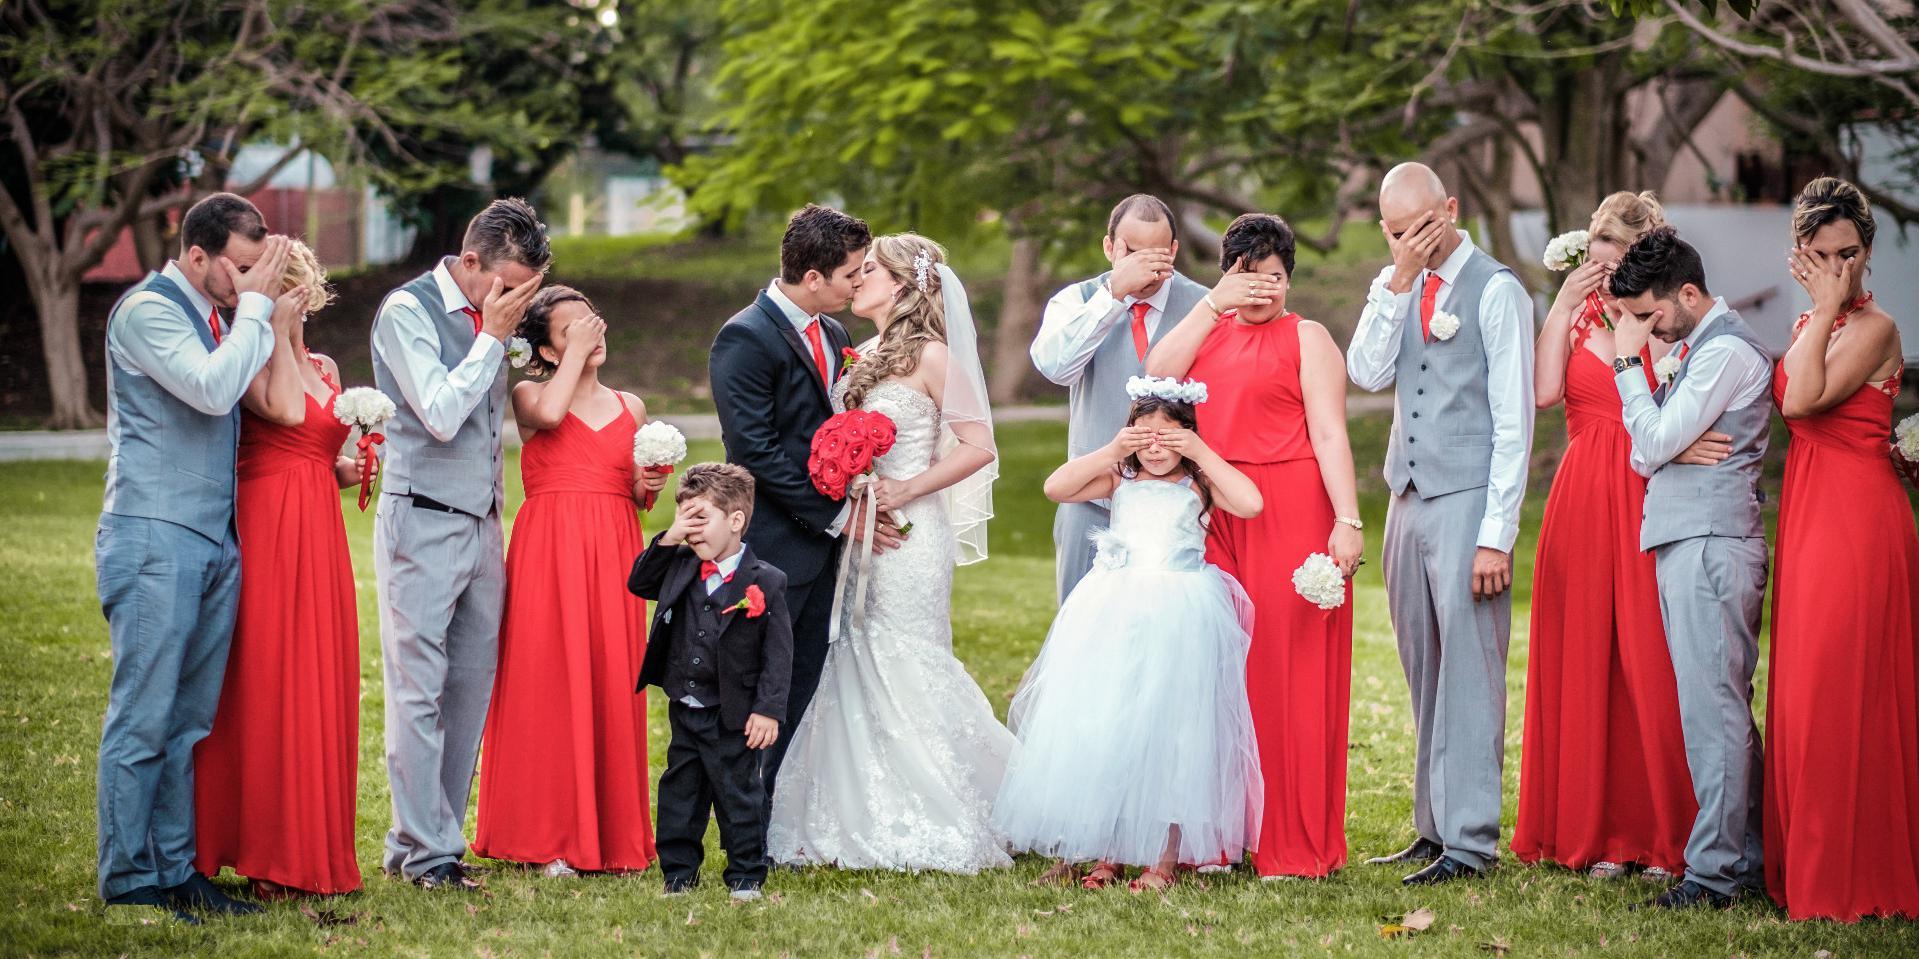 bodas-sin-clasificar-sin-tema-cuba-28271.jpg